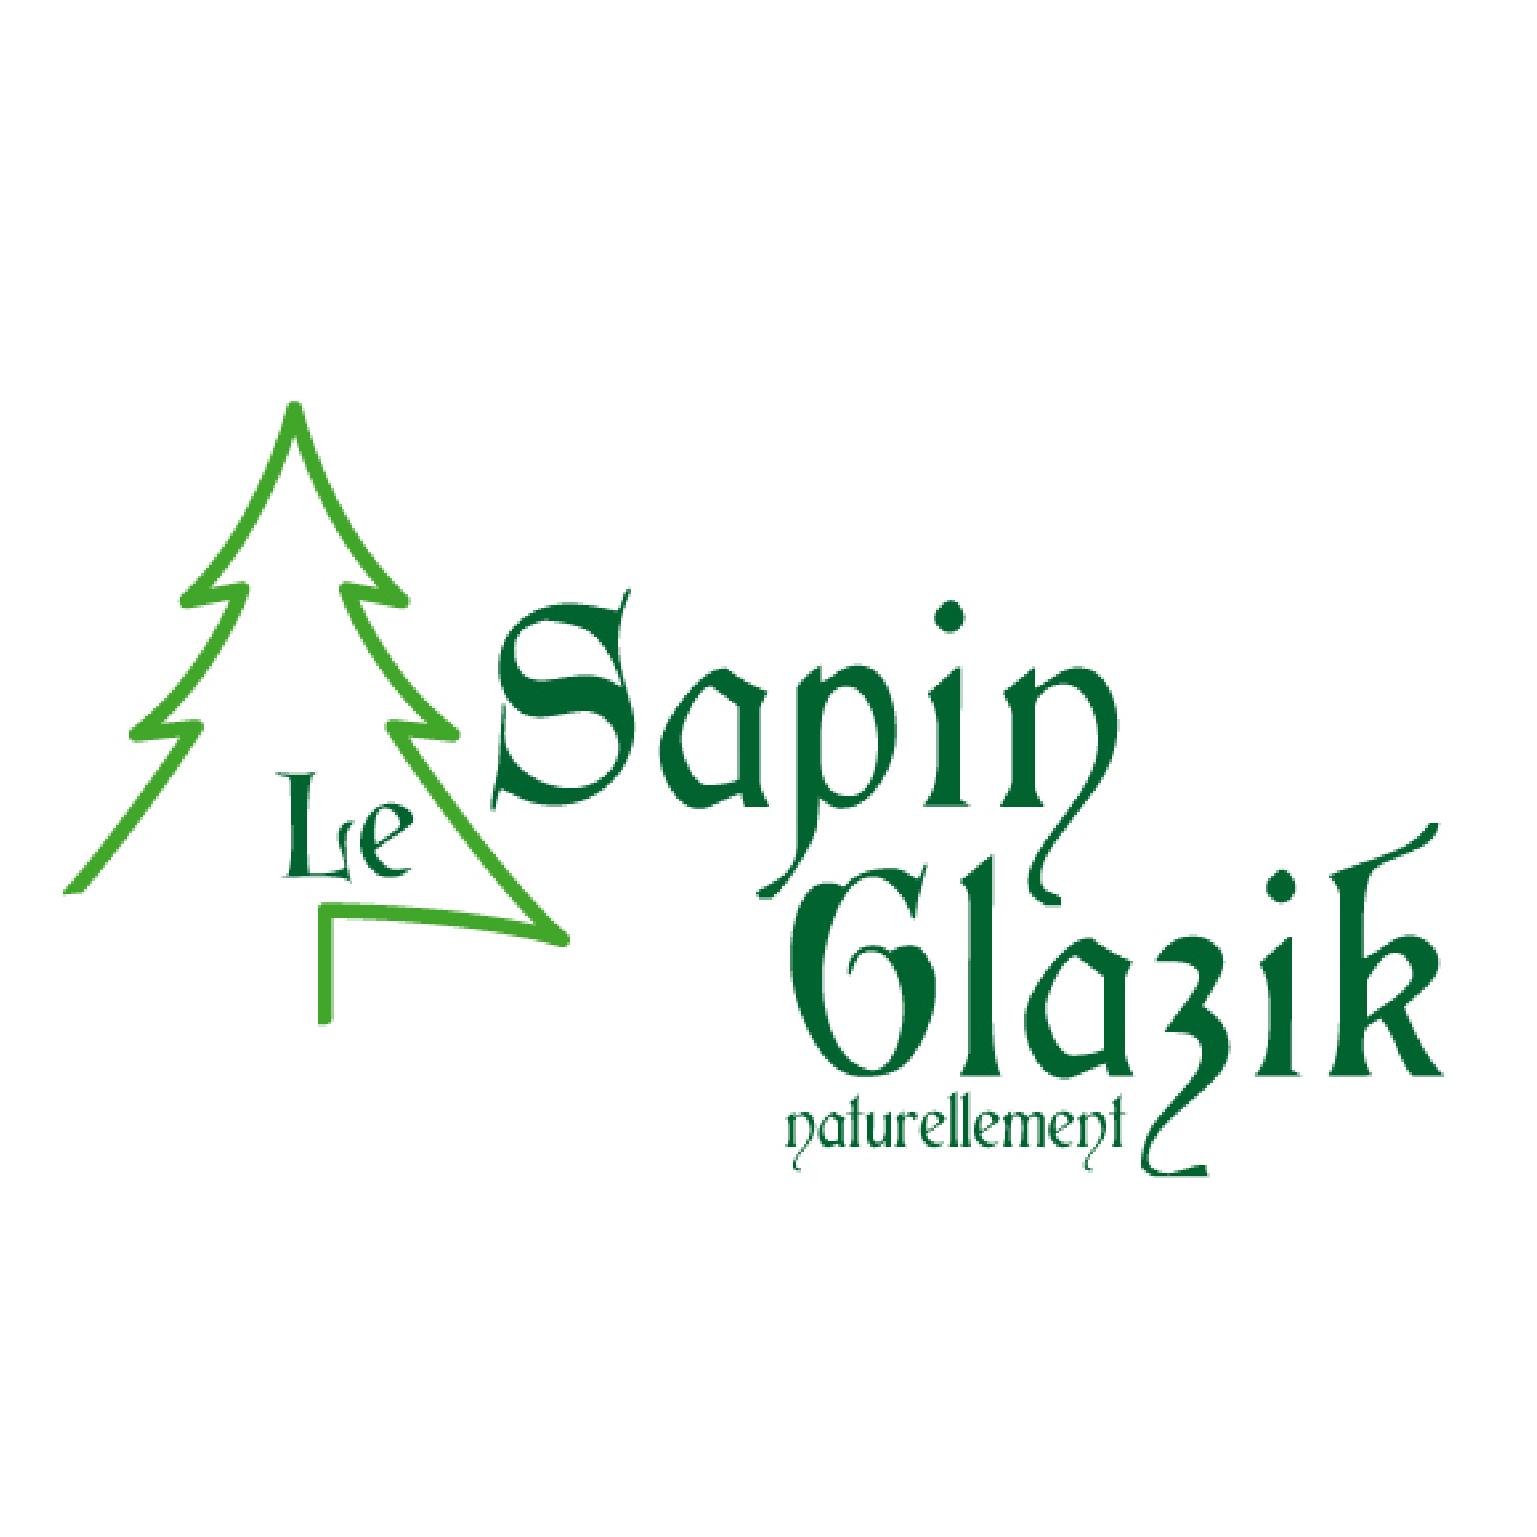 logo_SapinGlazik_Le Sapin Glazik